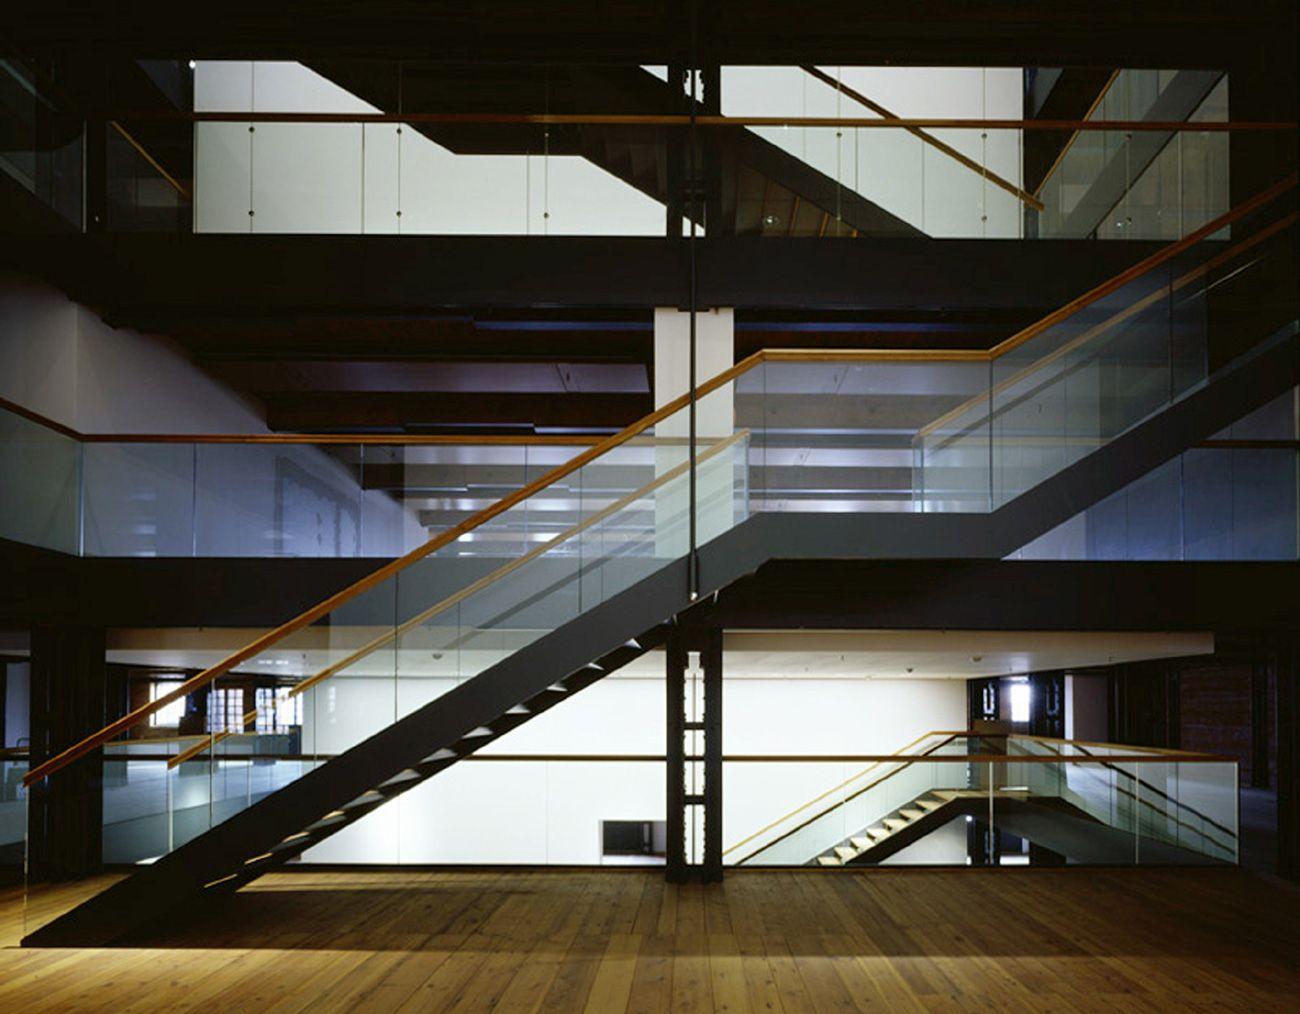 Treppenrenovierung Hamburg atrium mit treppe fotograf klaus frahm international maritime